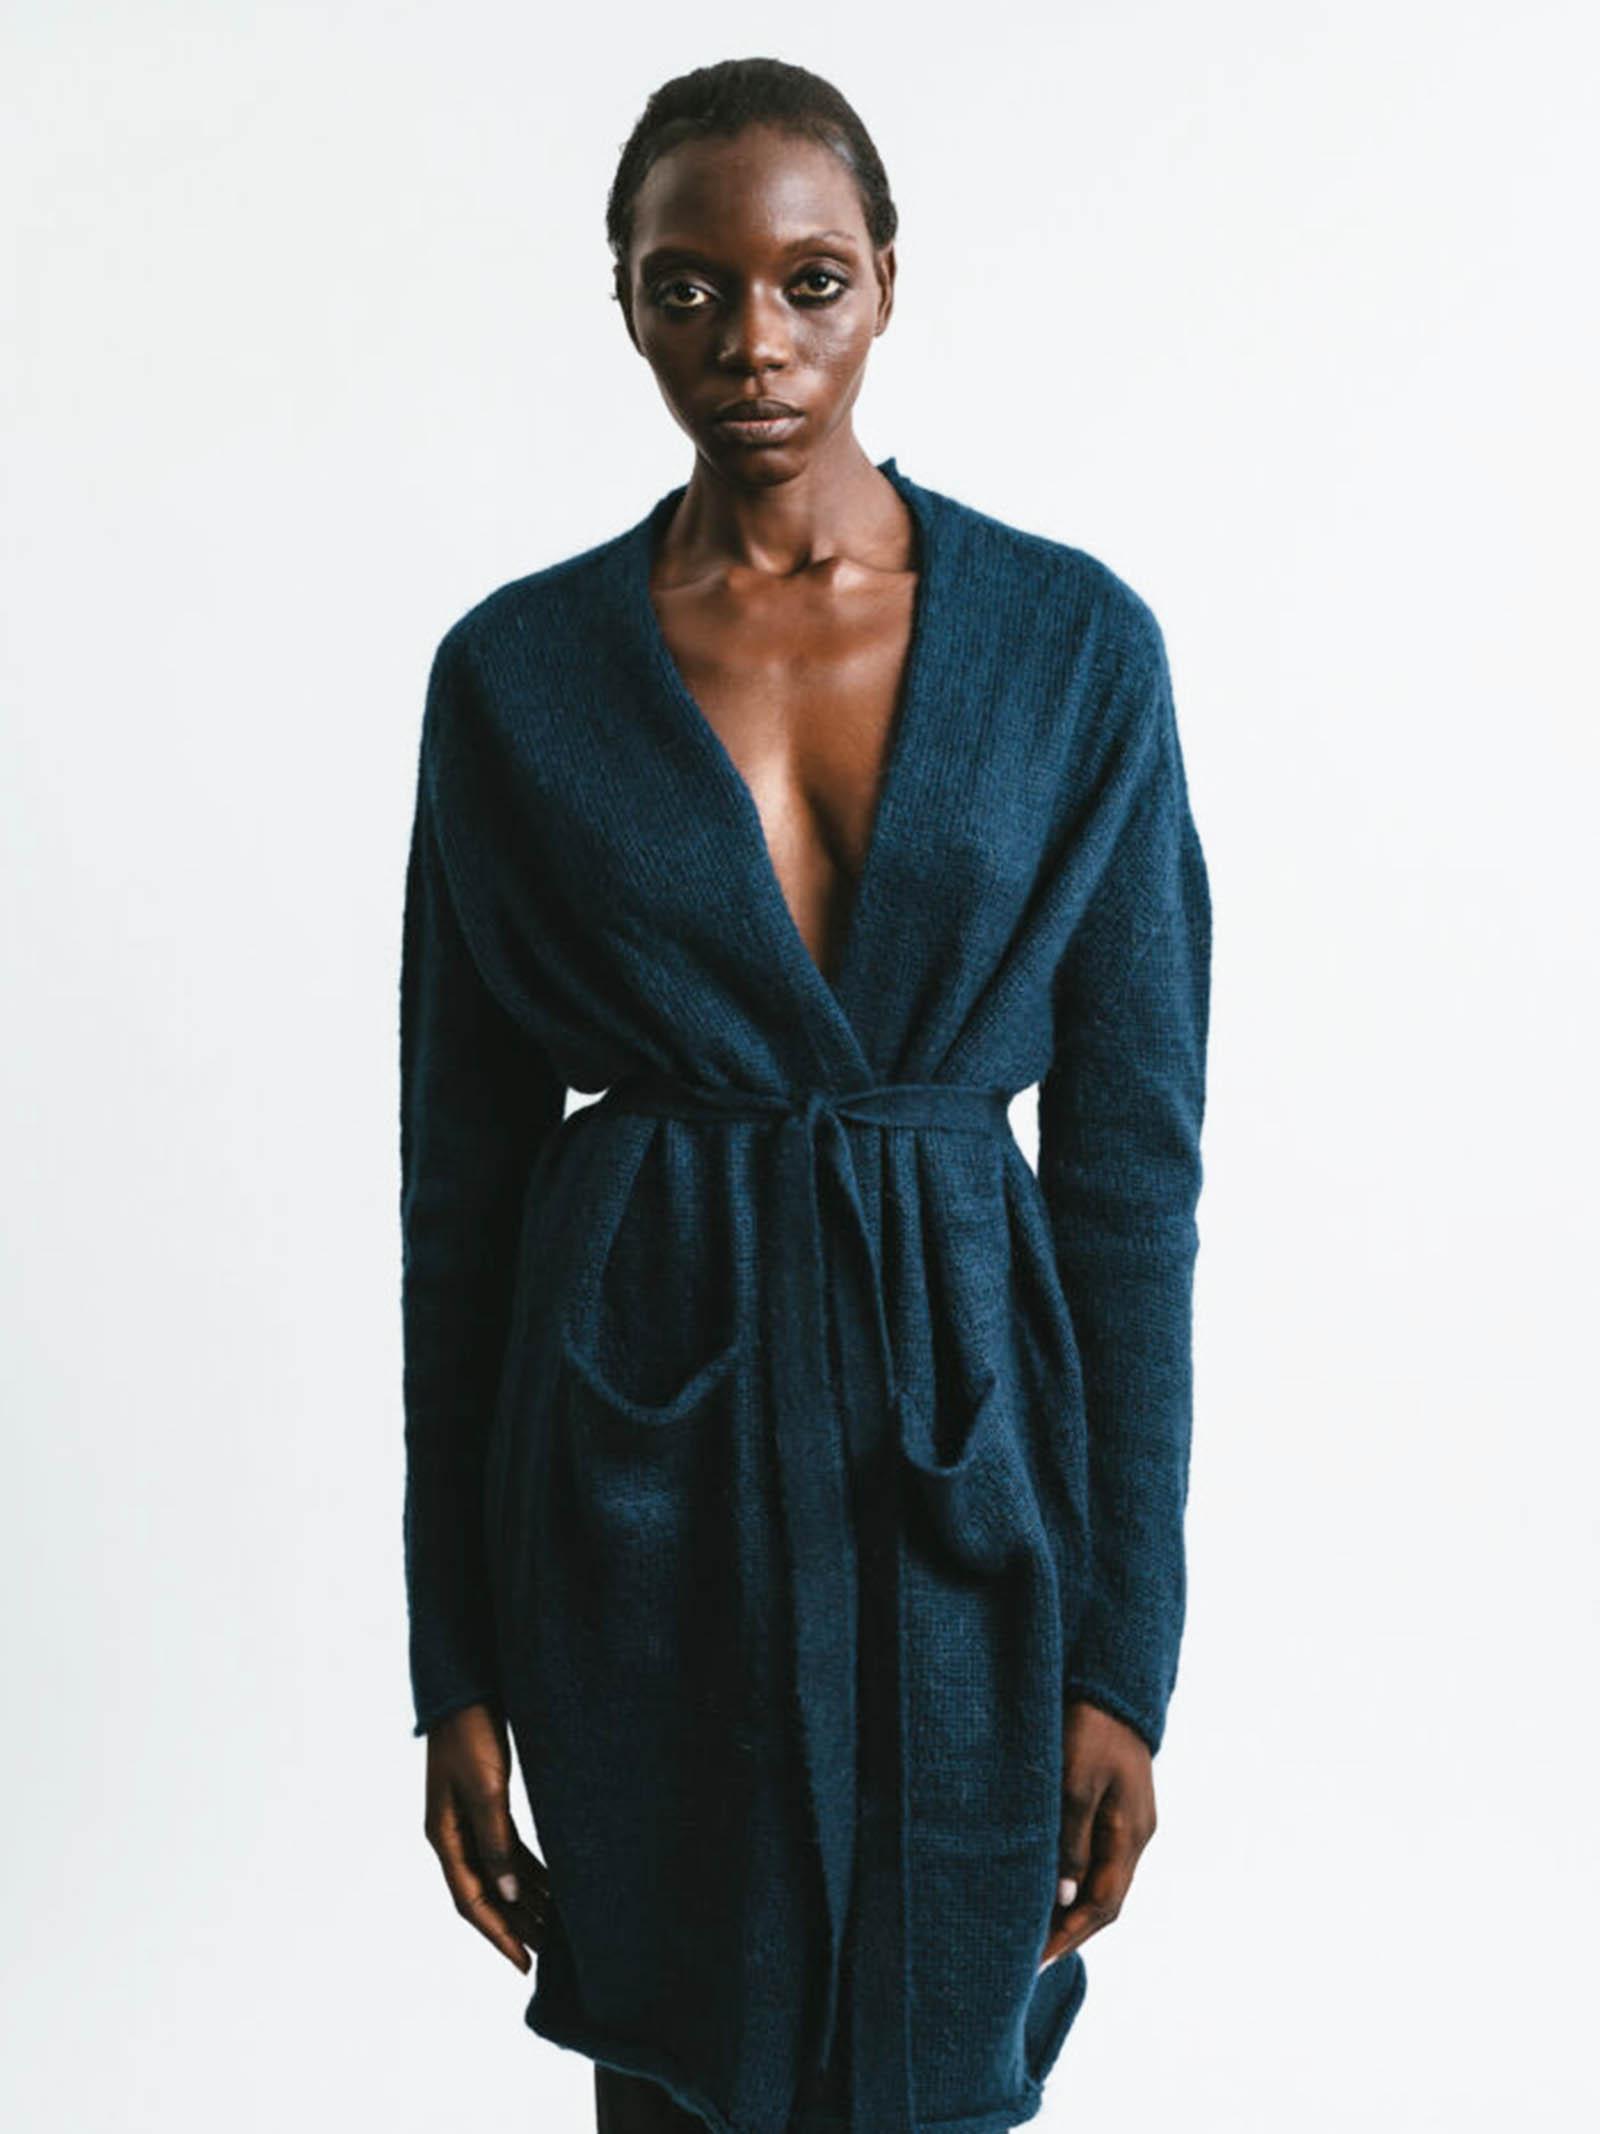 Abbigliamento Donna Cardigan Lungo in Mohair Blu Senza Bottoni con Cintura a Tono Pink Memories | Maglieria | 1113903